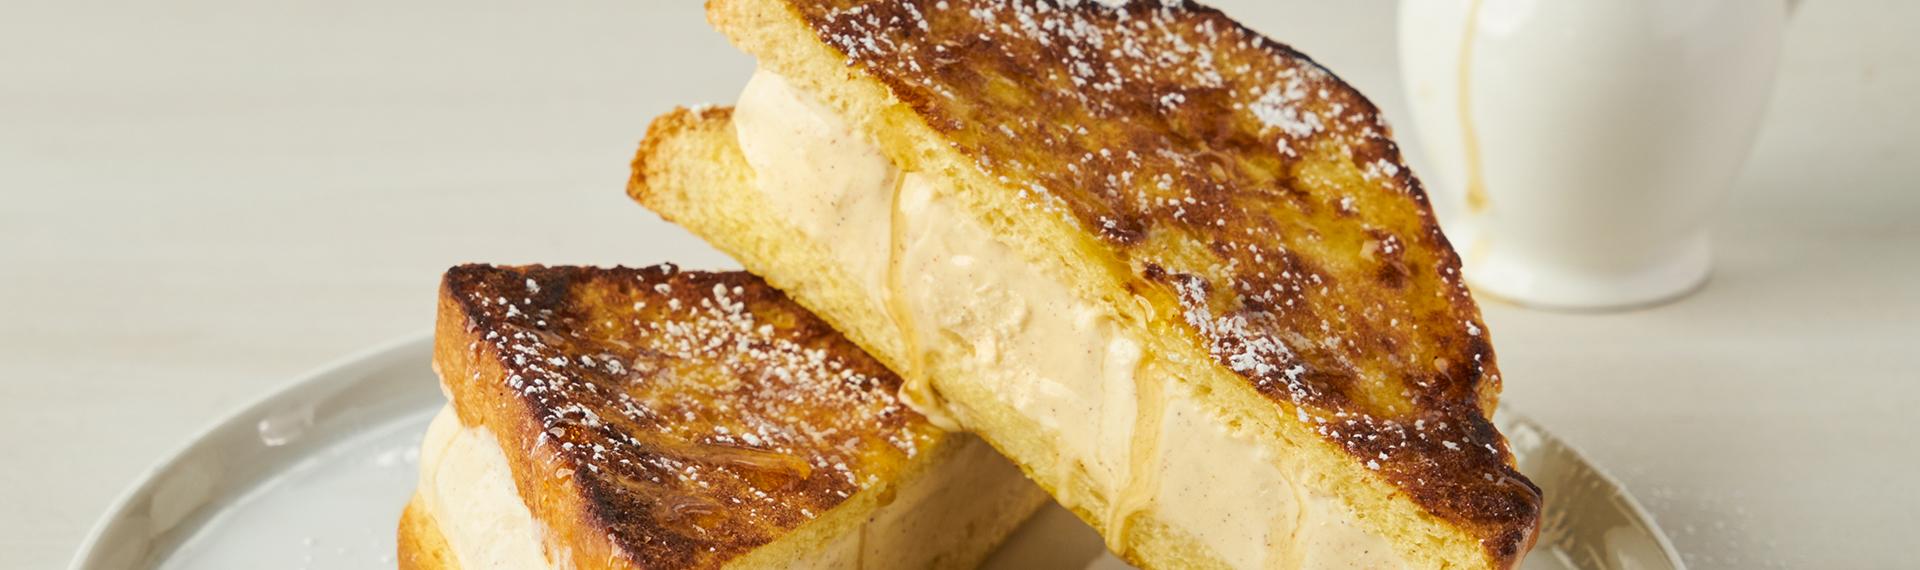 Cinnamon Toast Brunch